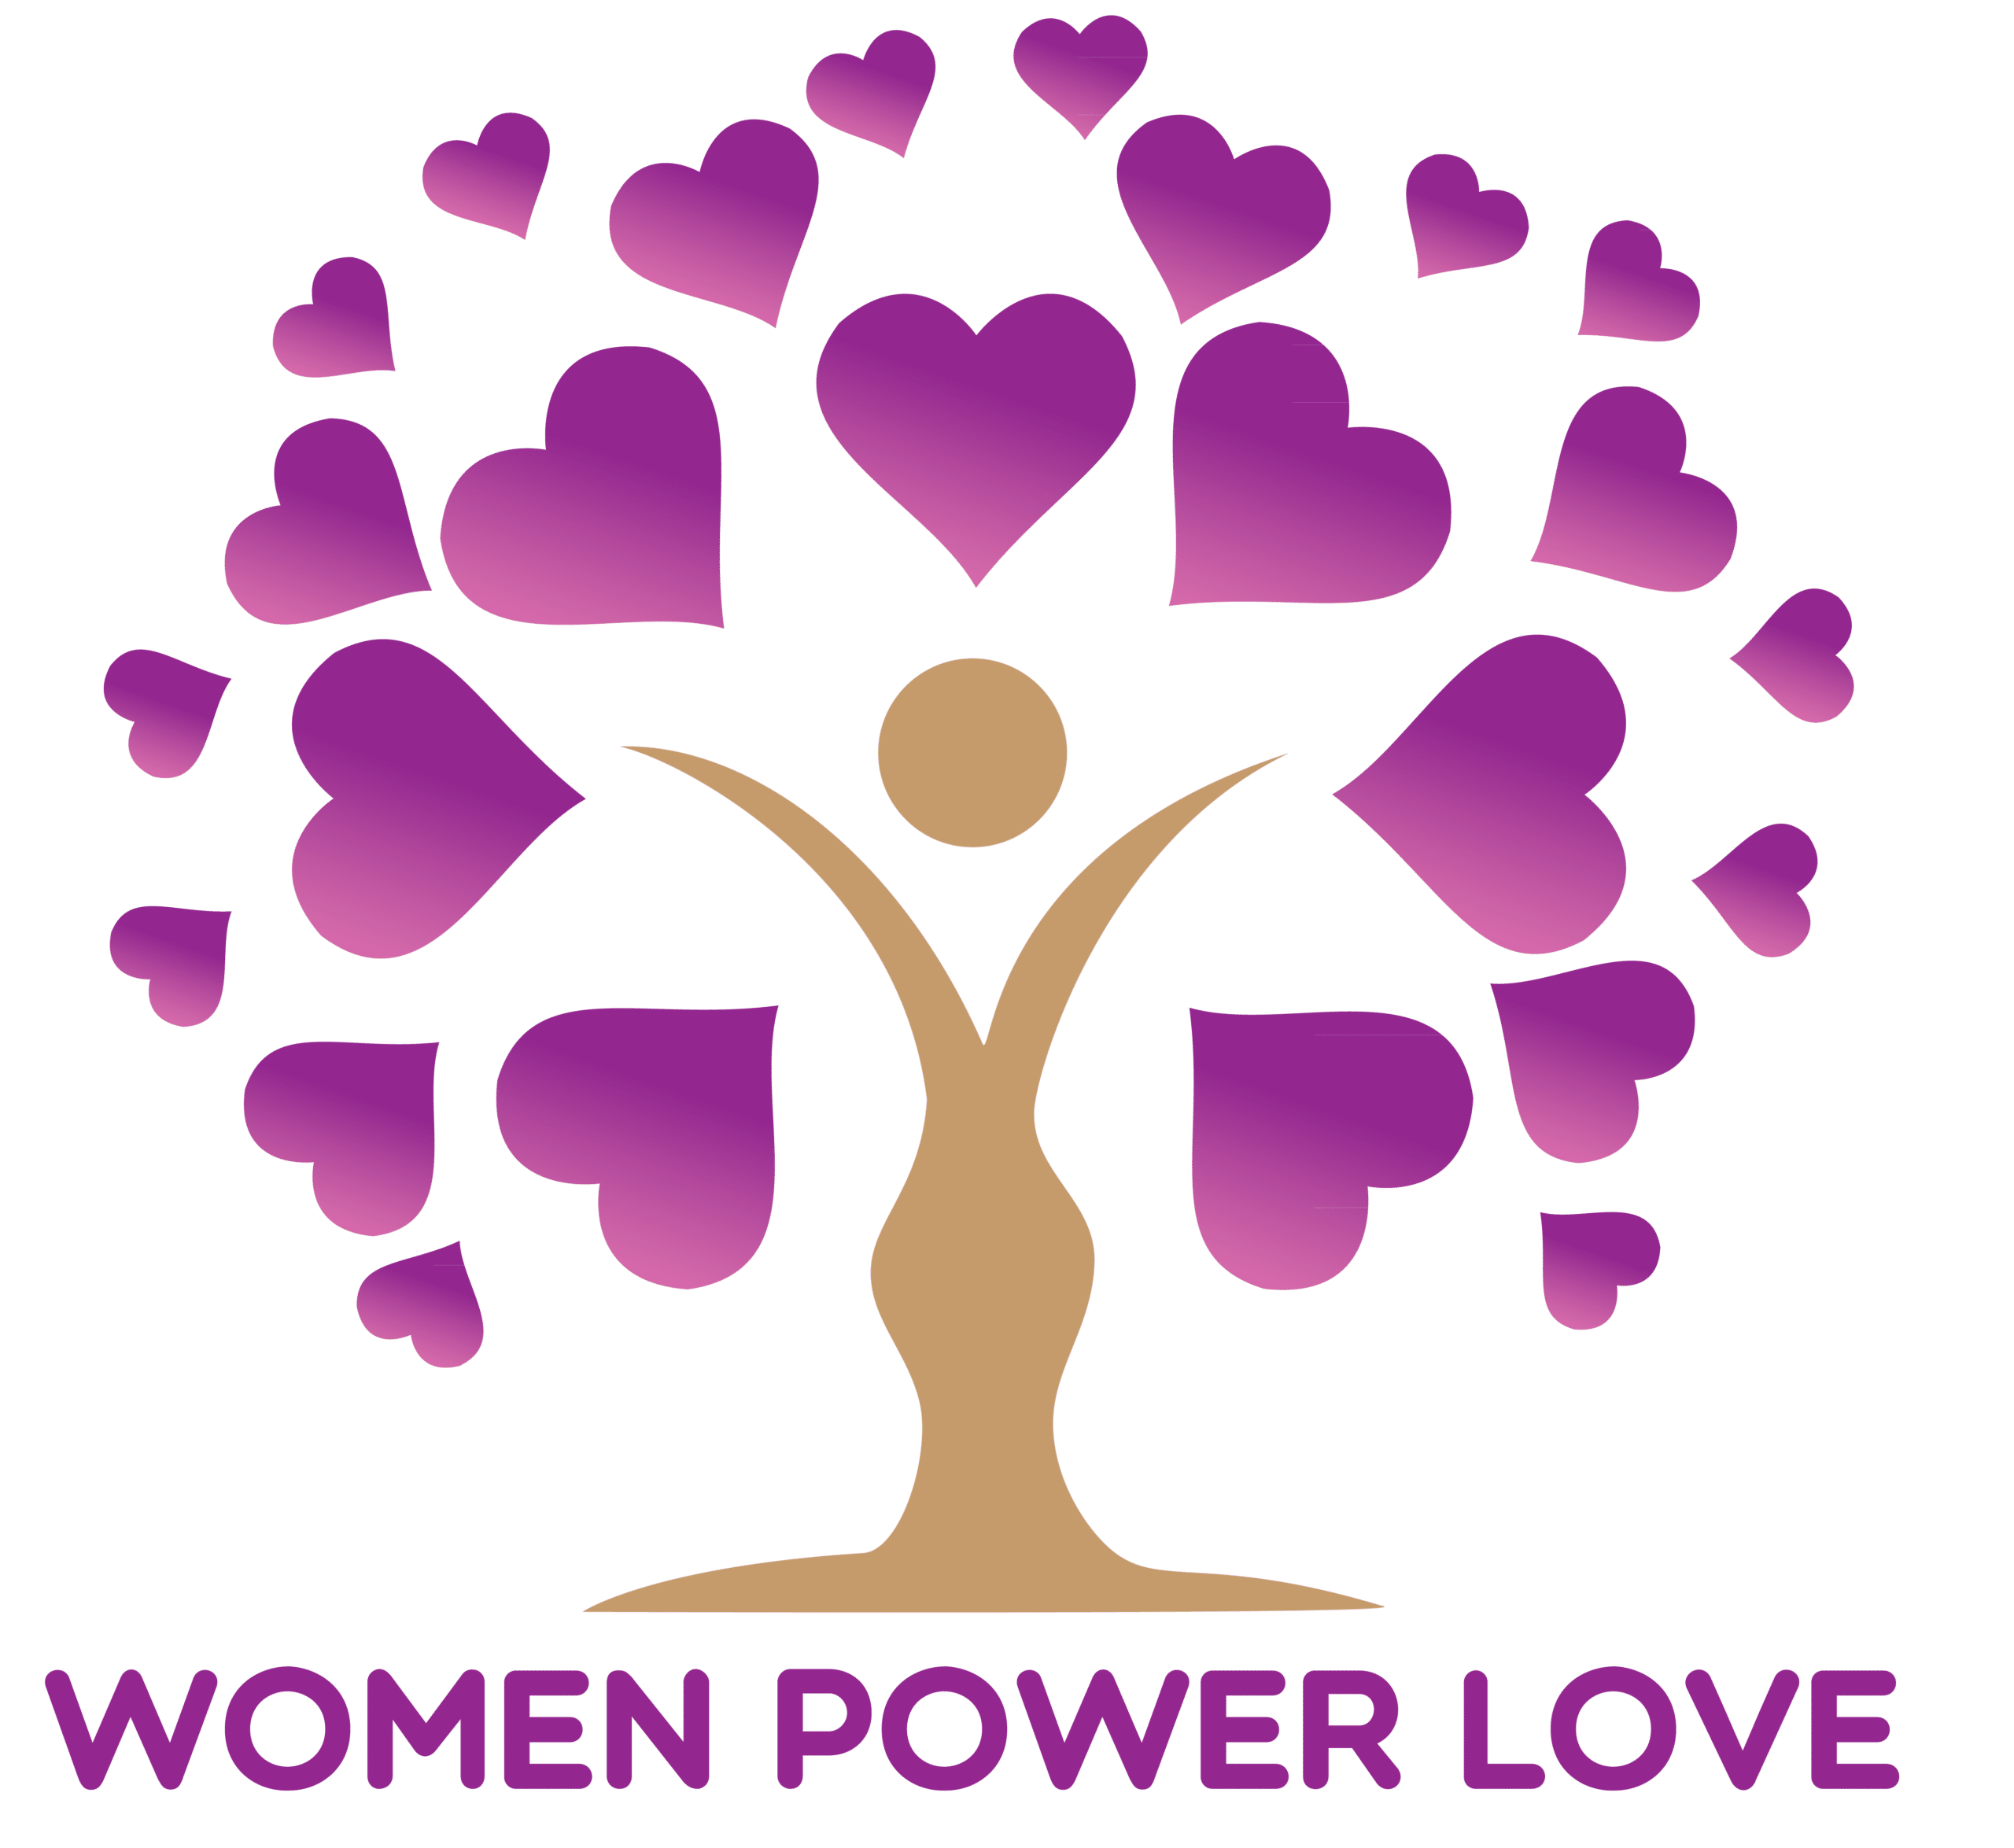 women power love foundation